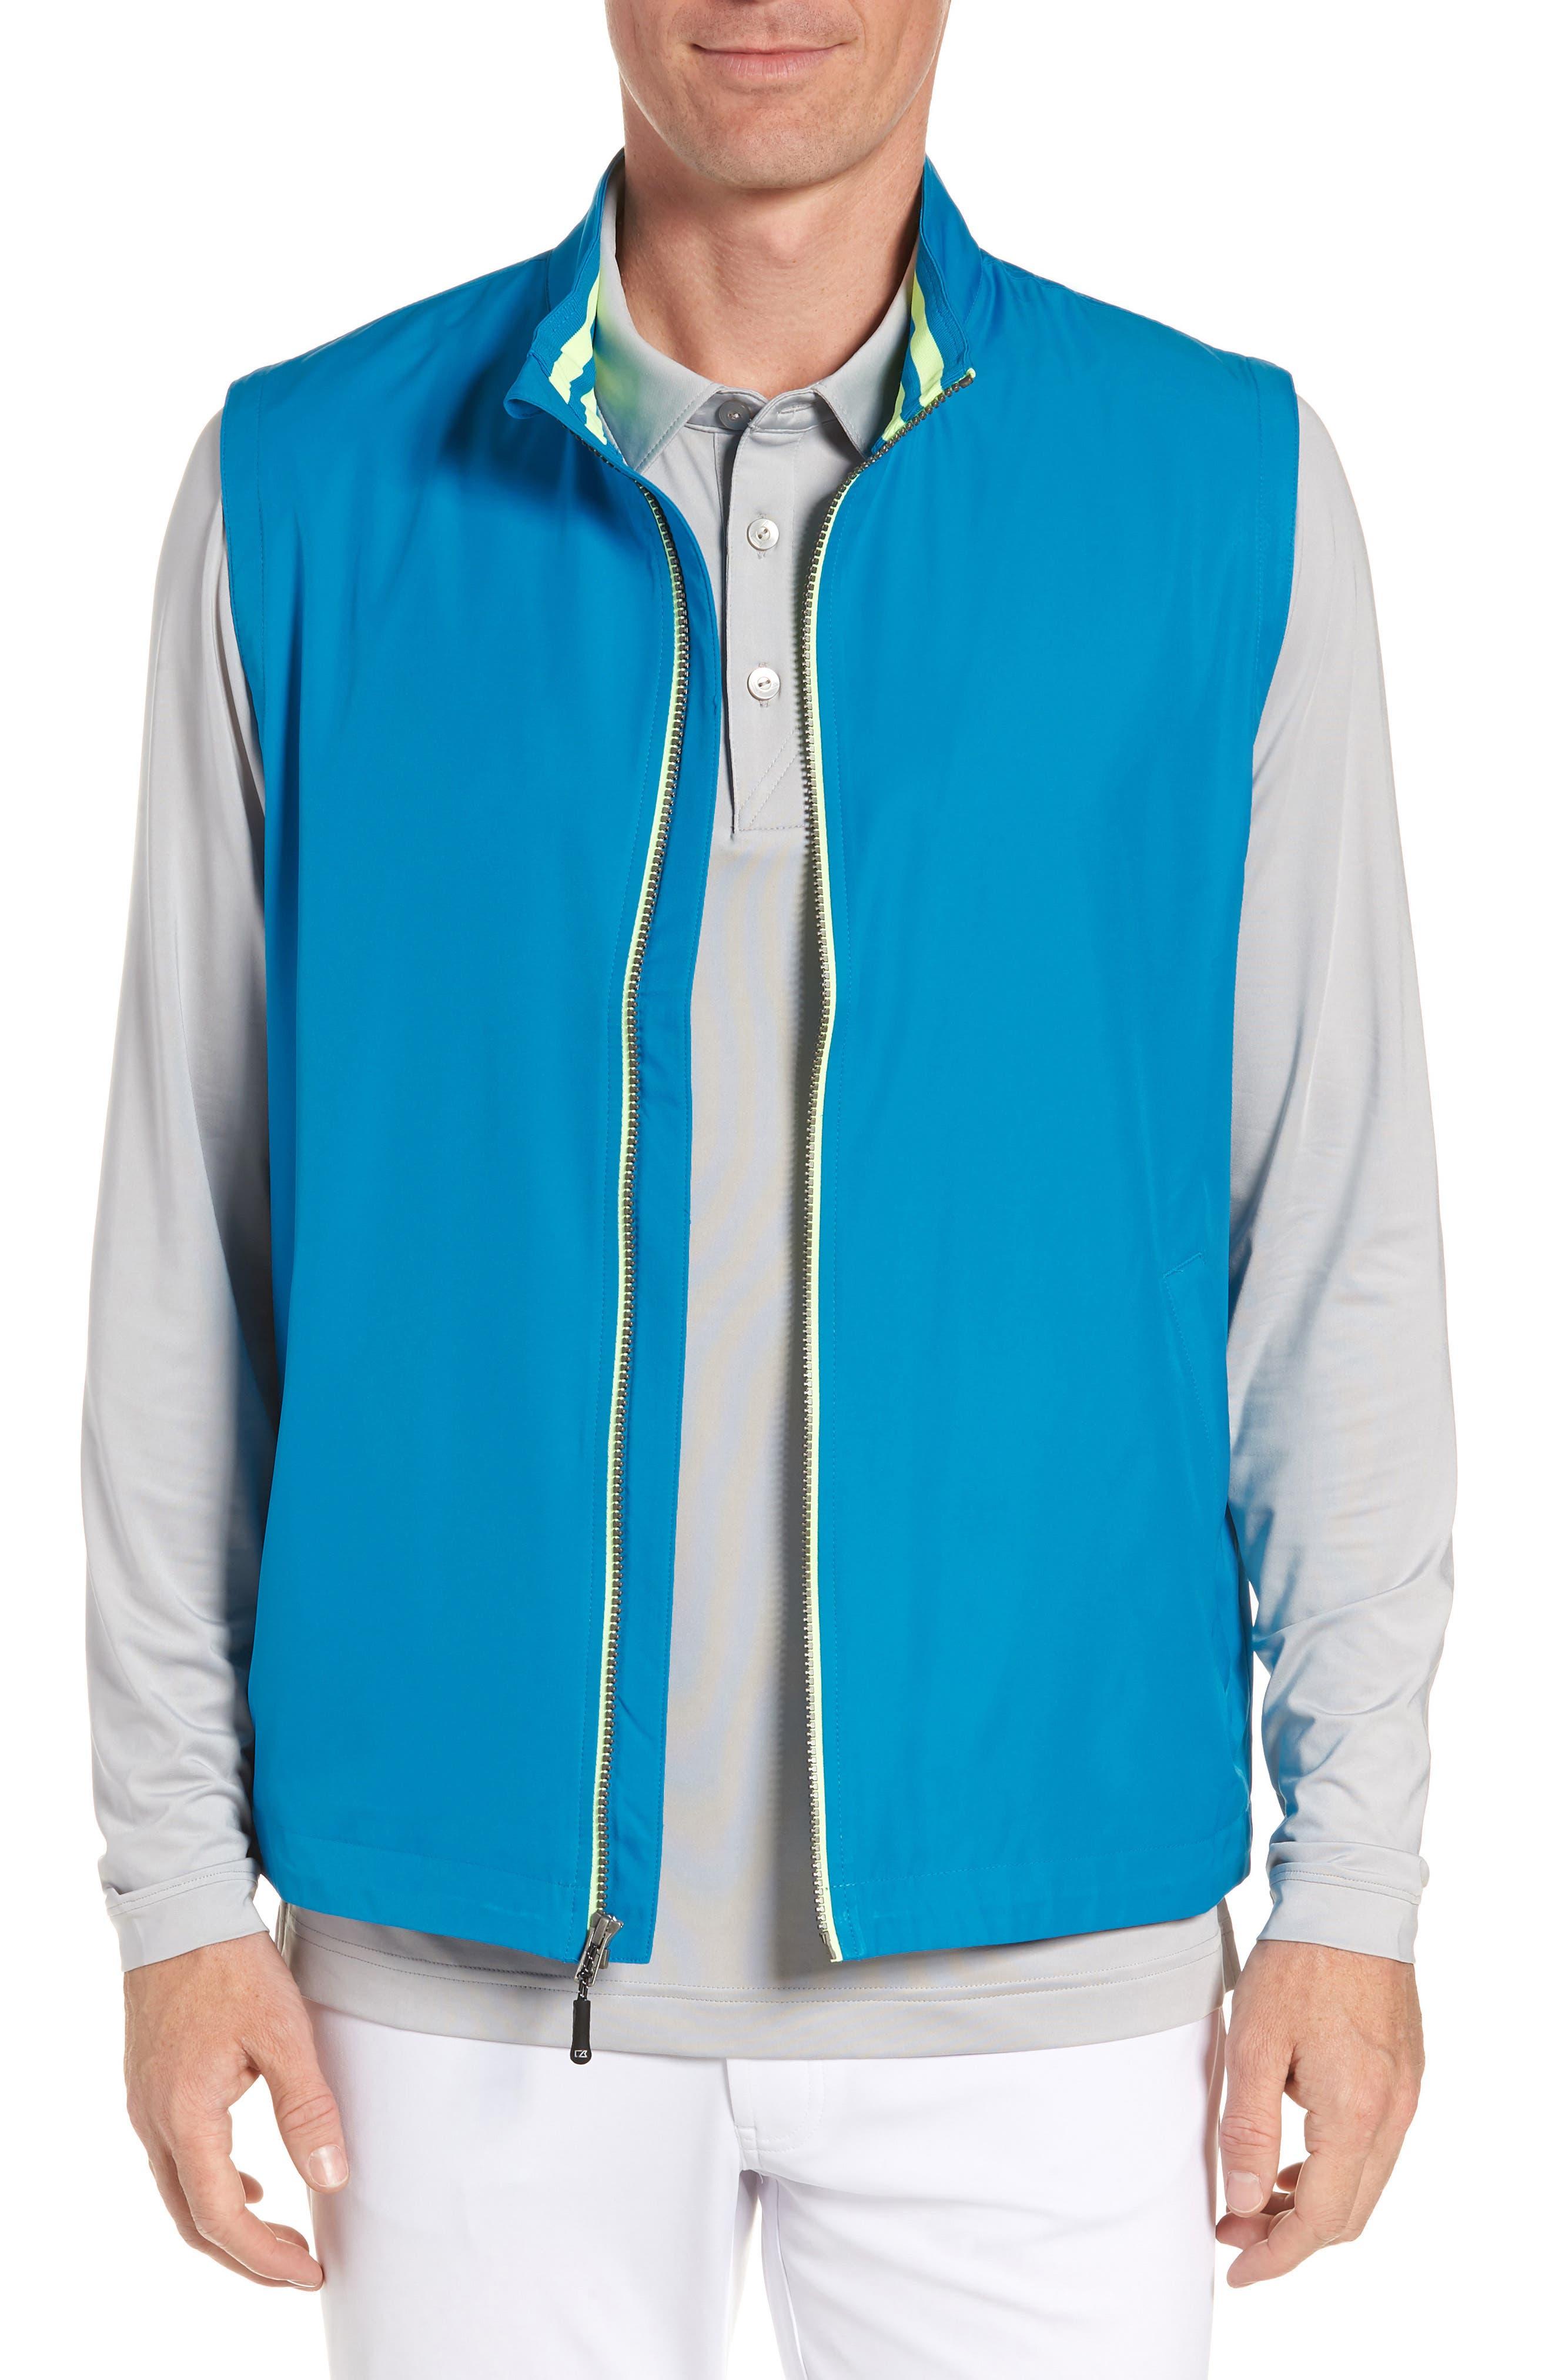 Cutter & Buck Nine Iron Drytec Zip Vest, Blue